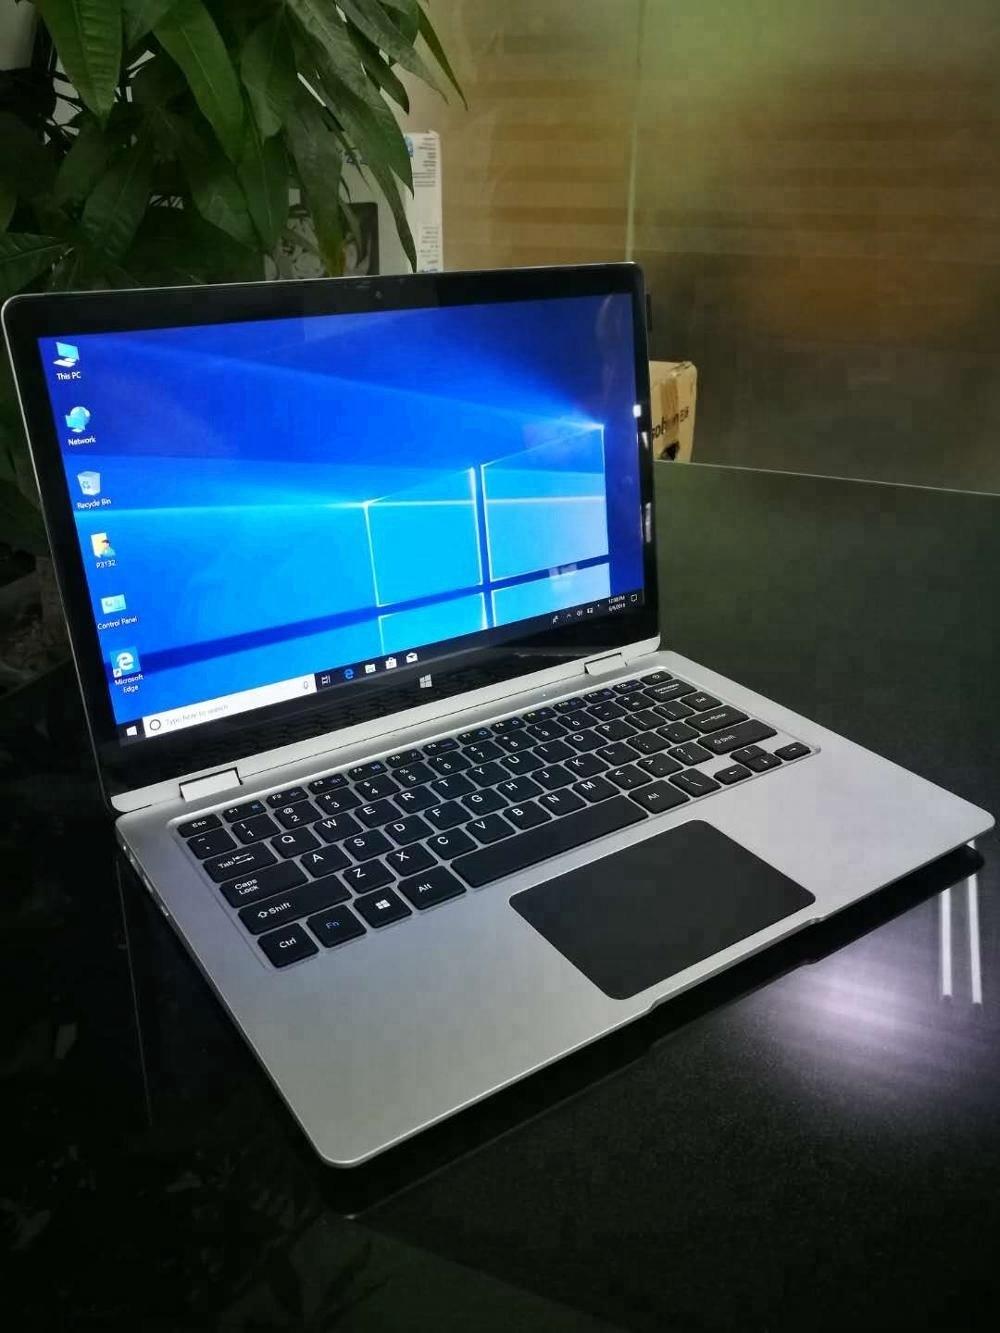 Light and stylish Jumper EZbook 3 Se Laptop, 13.3 inch, 3GB+64GB